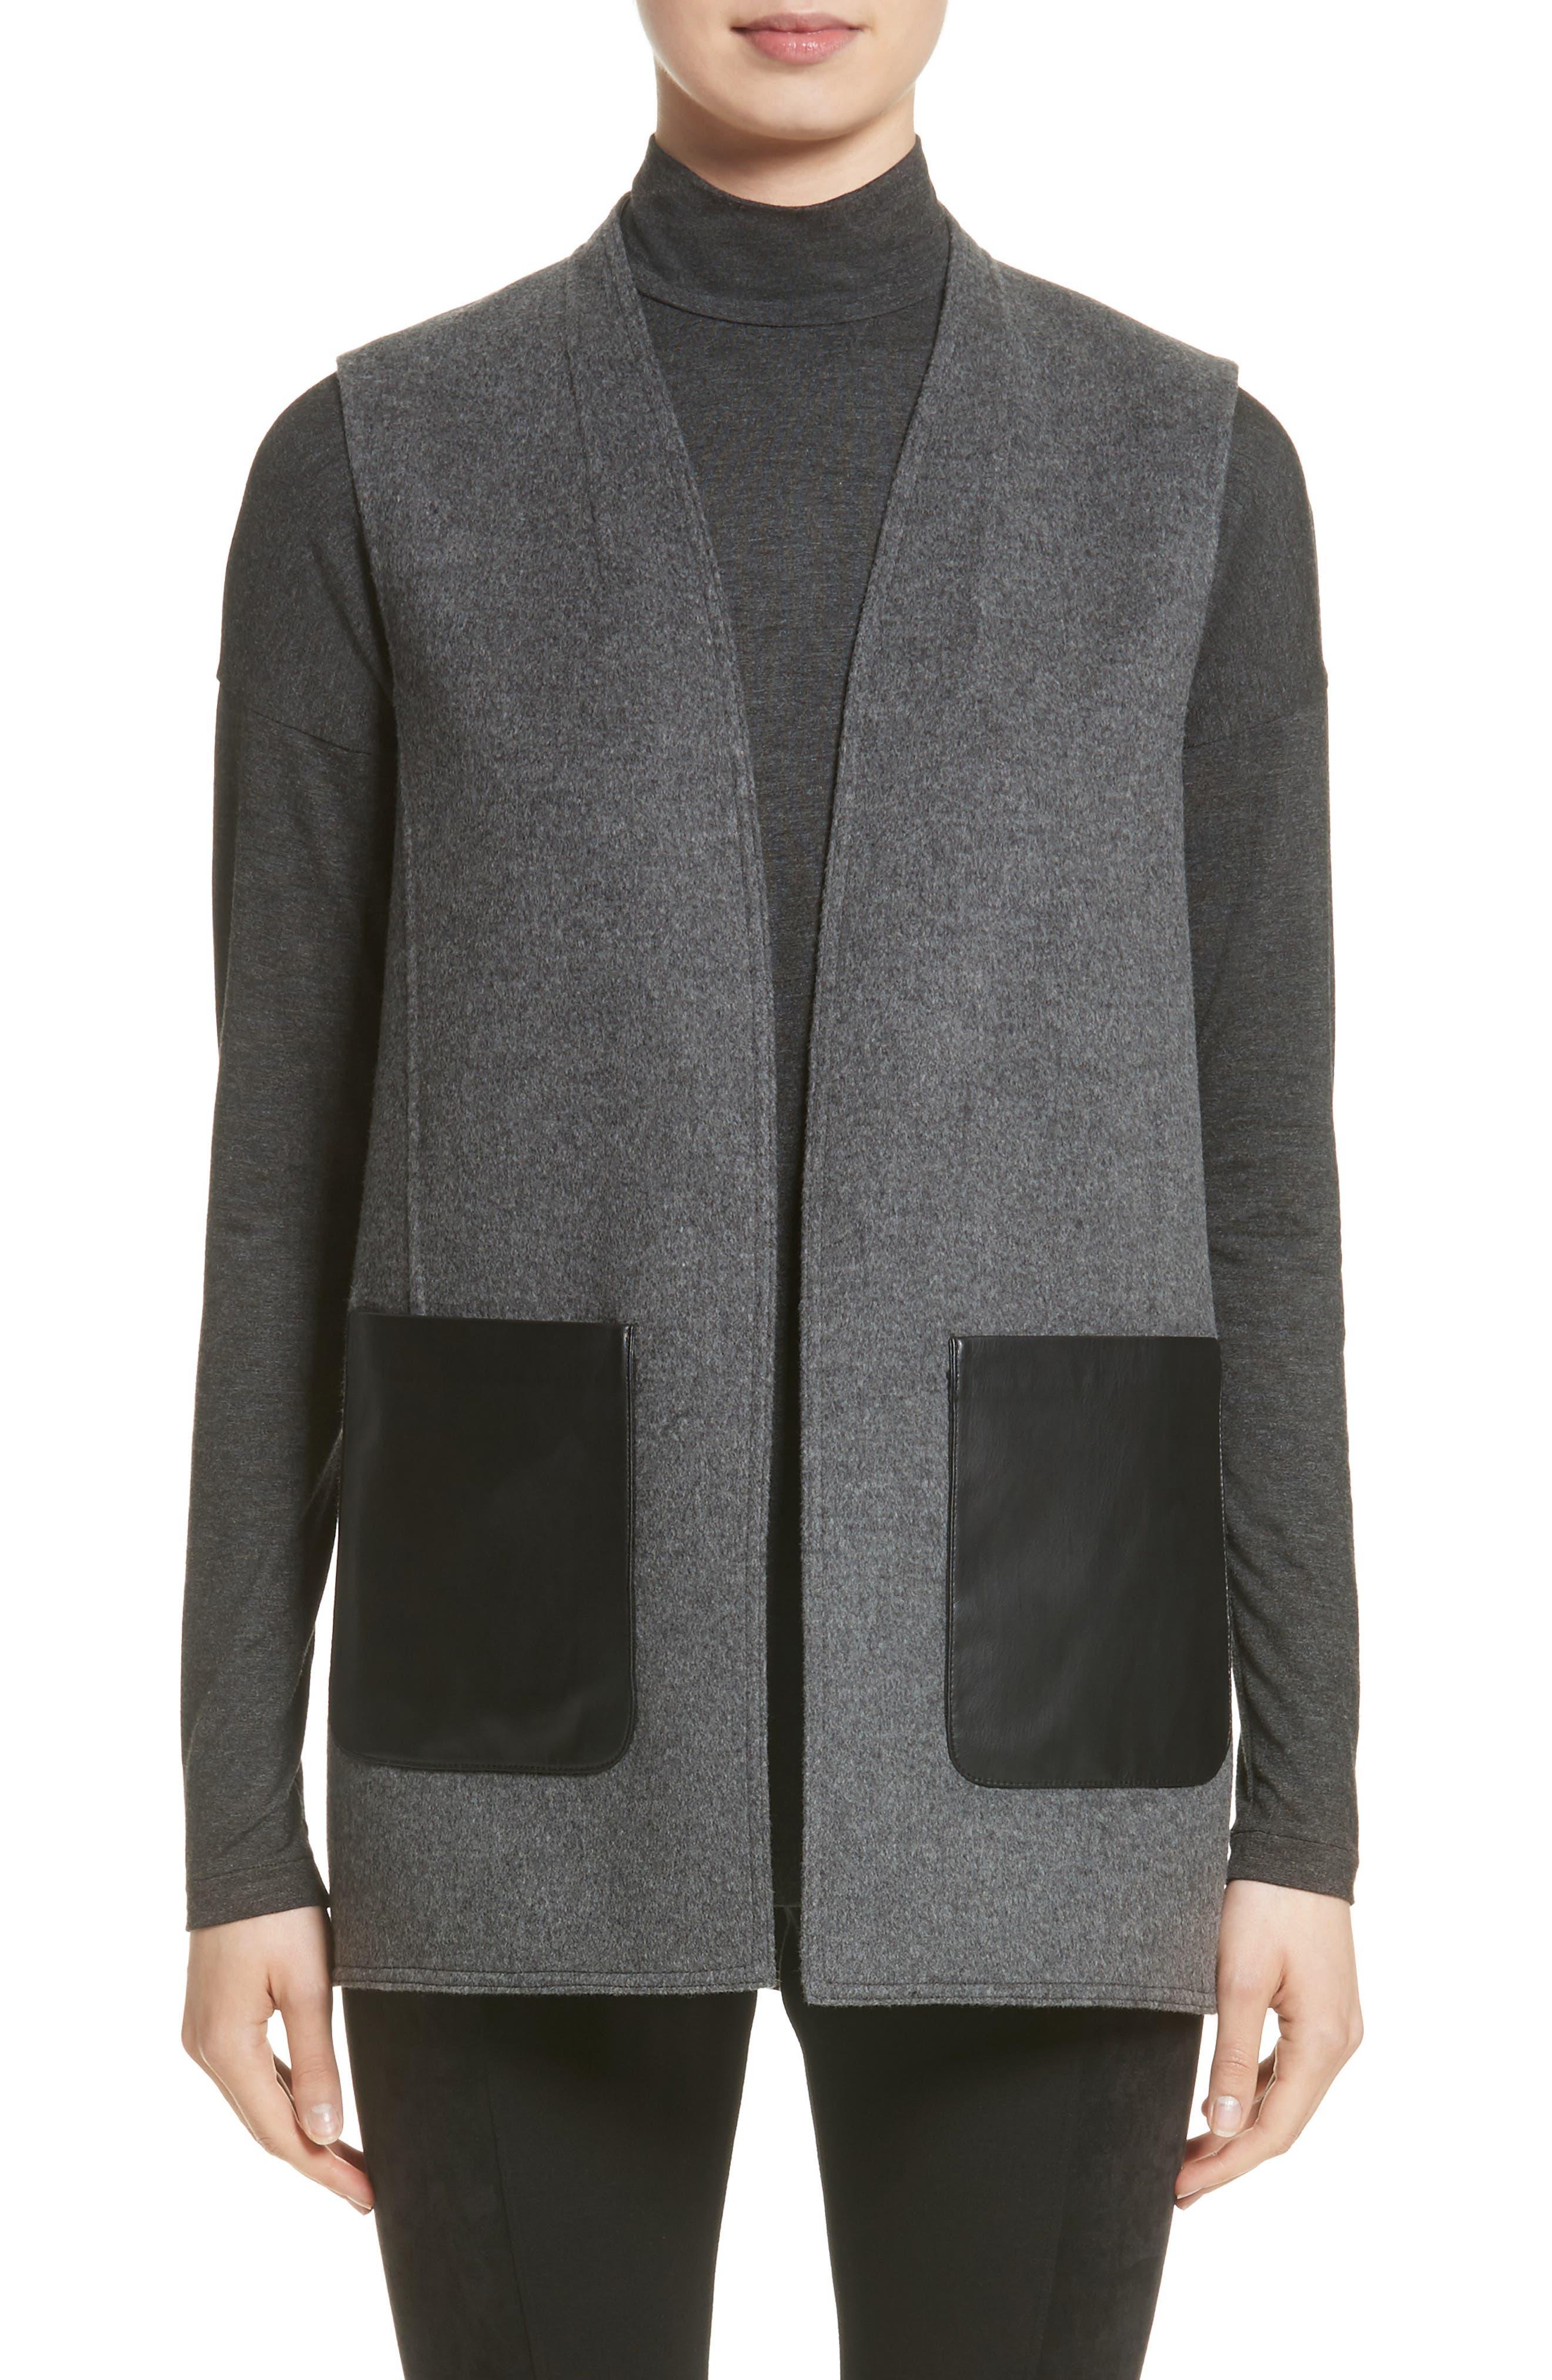 LAFAYETTE 148 NEW YORK Nika Wool & Cashmere Reversible Vest